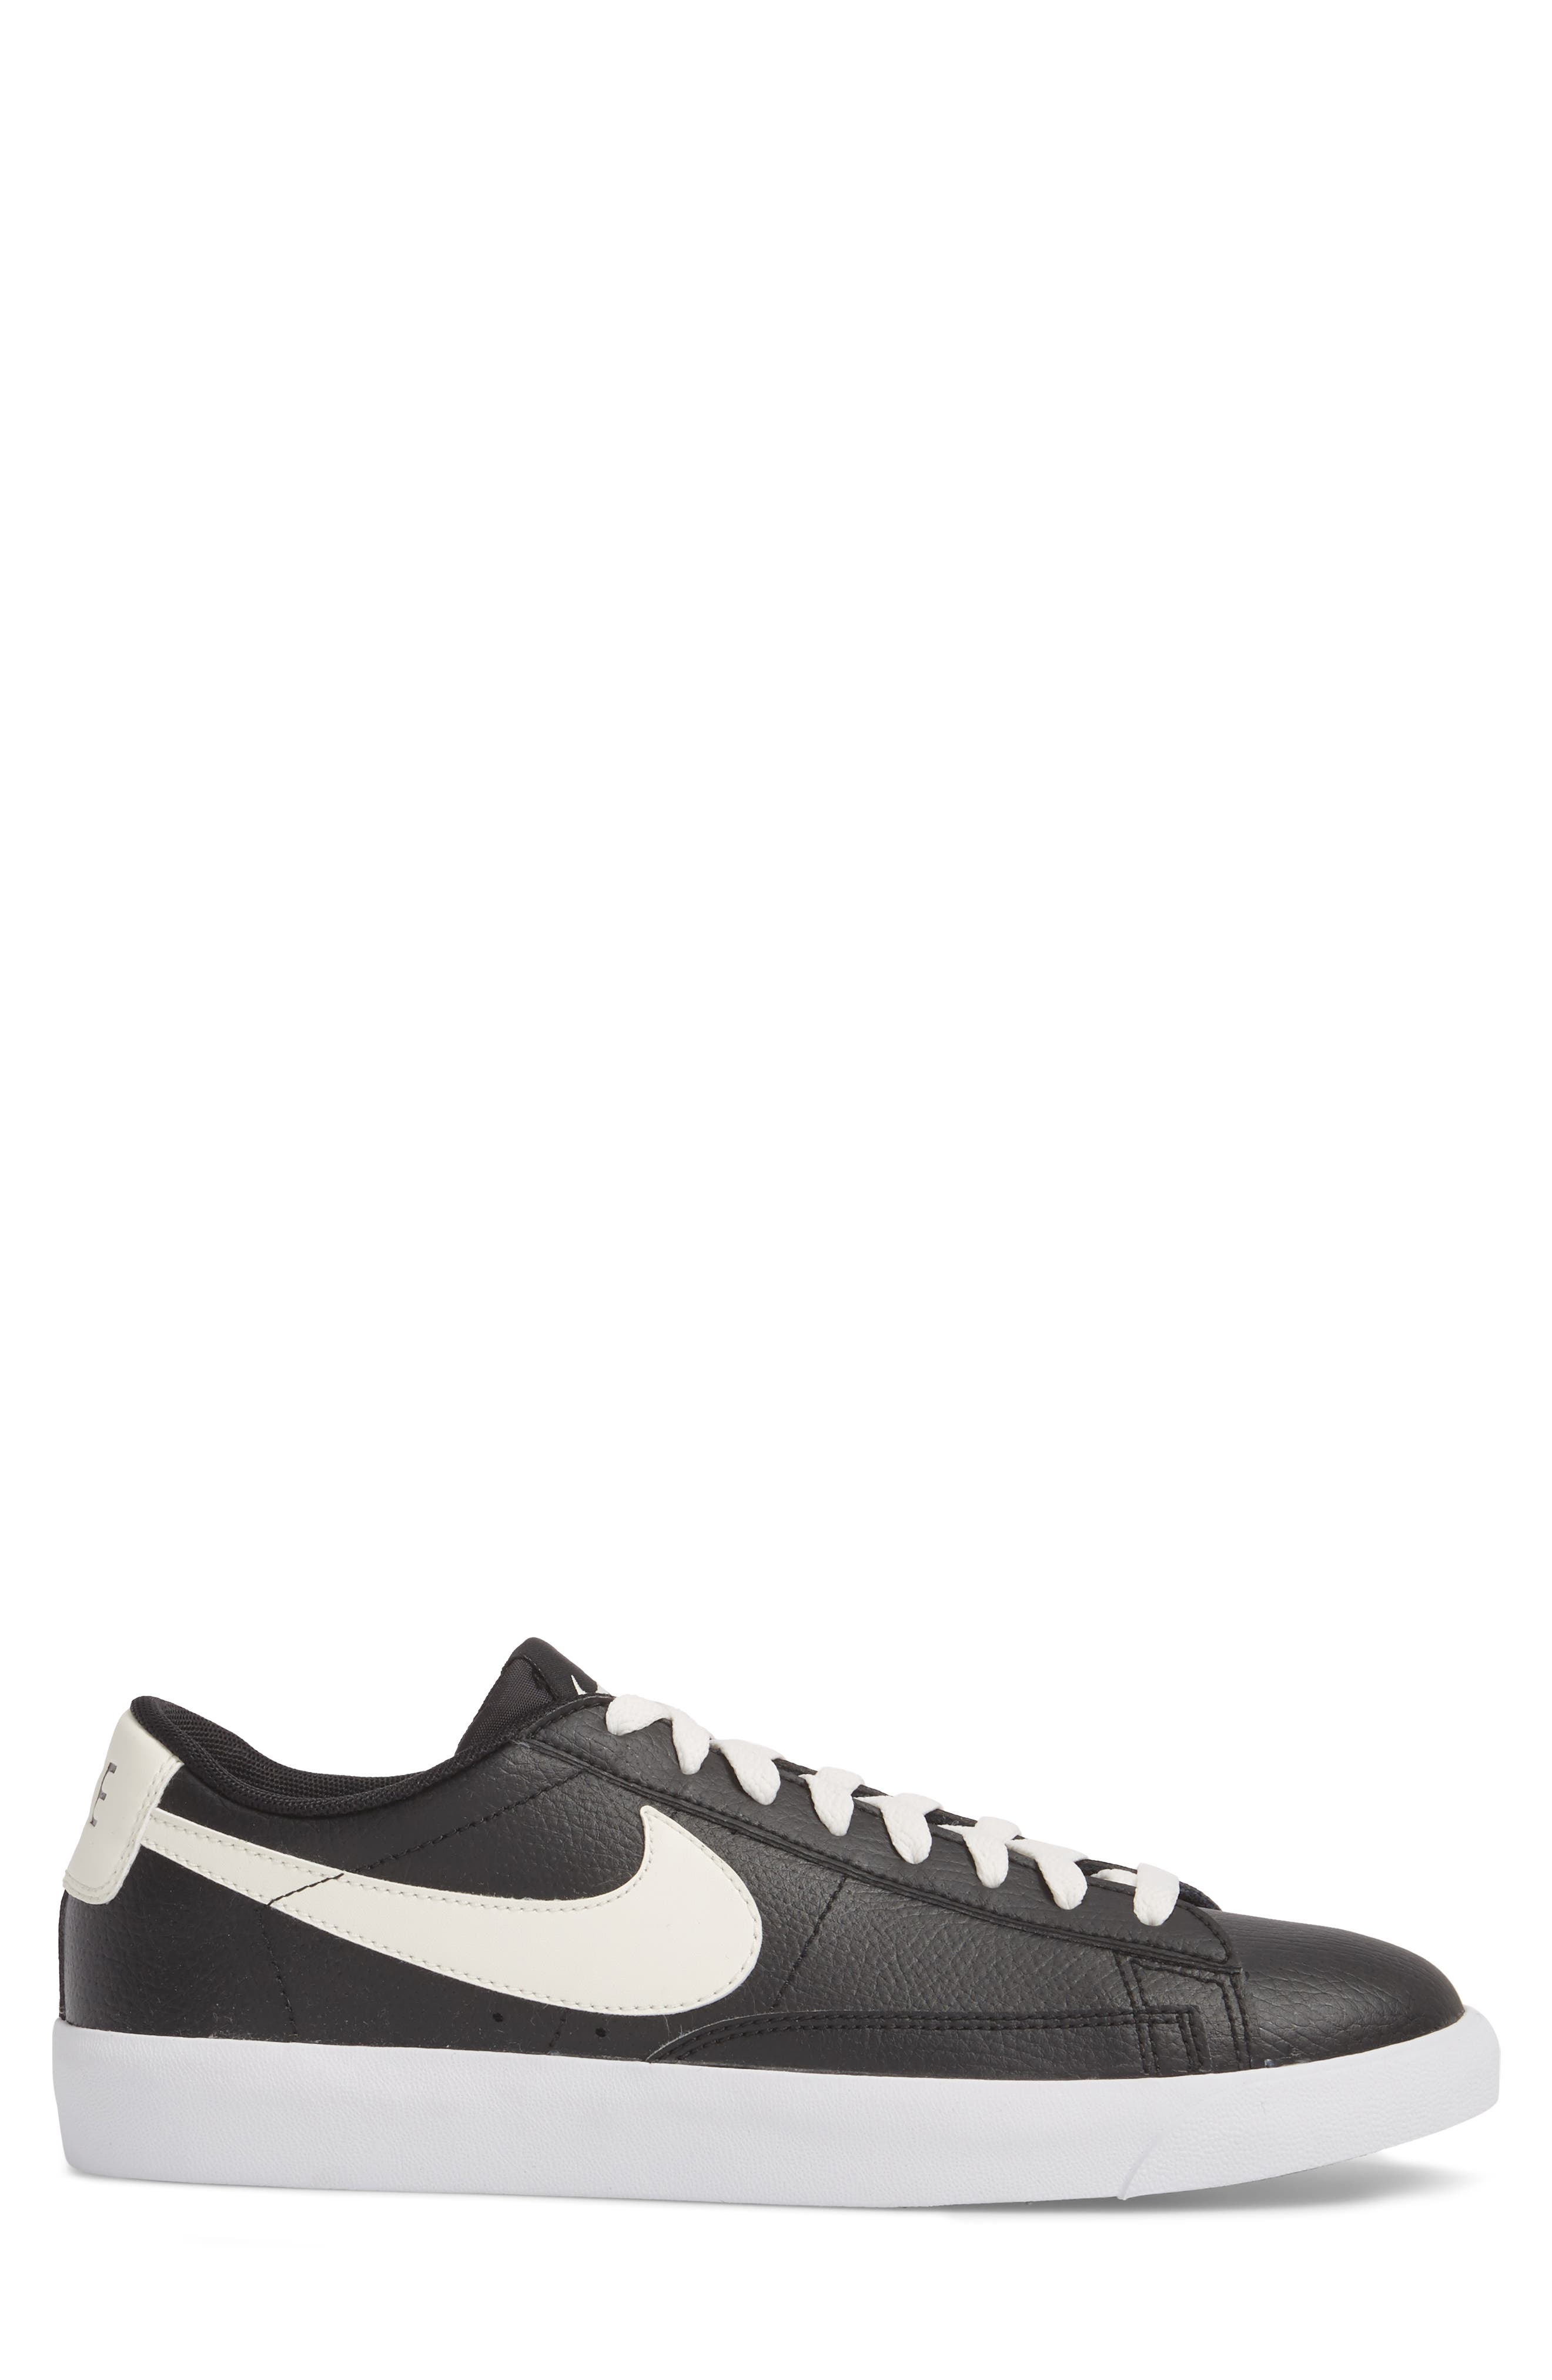 Blazer Low Leather Sneaker,                             Alternate thumbnail 3, color,                             Black/ Sail